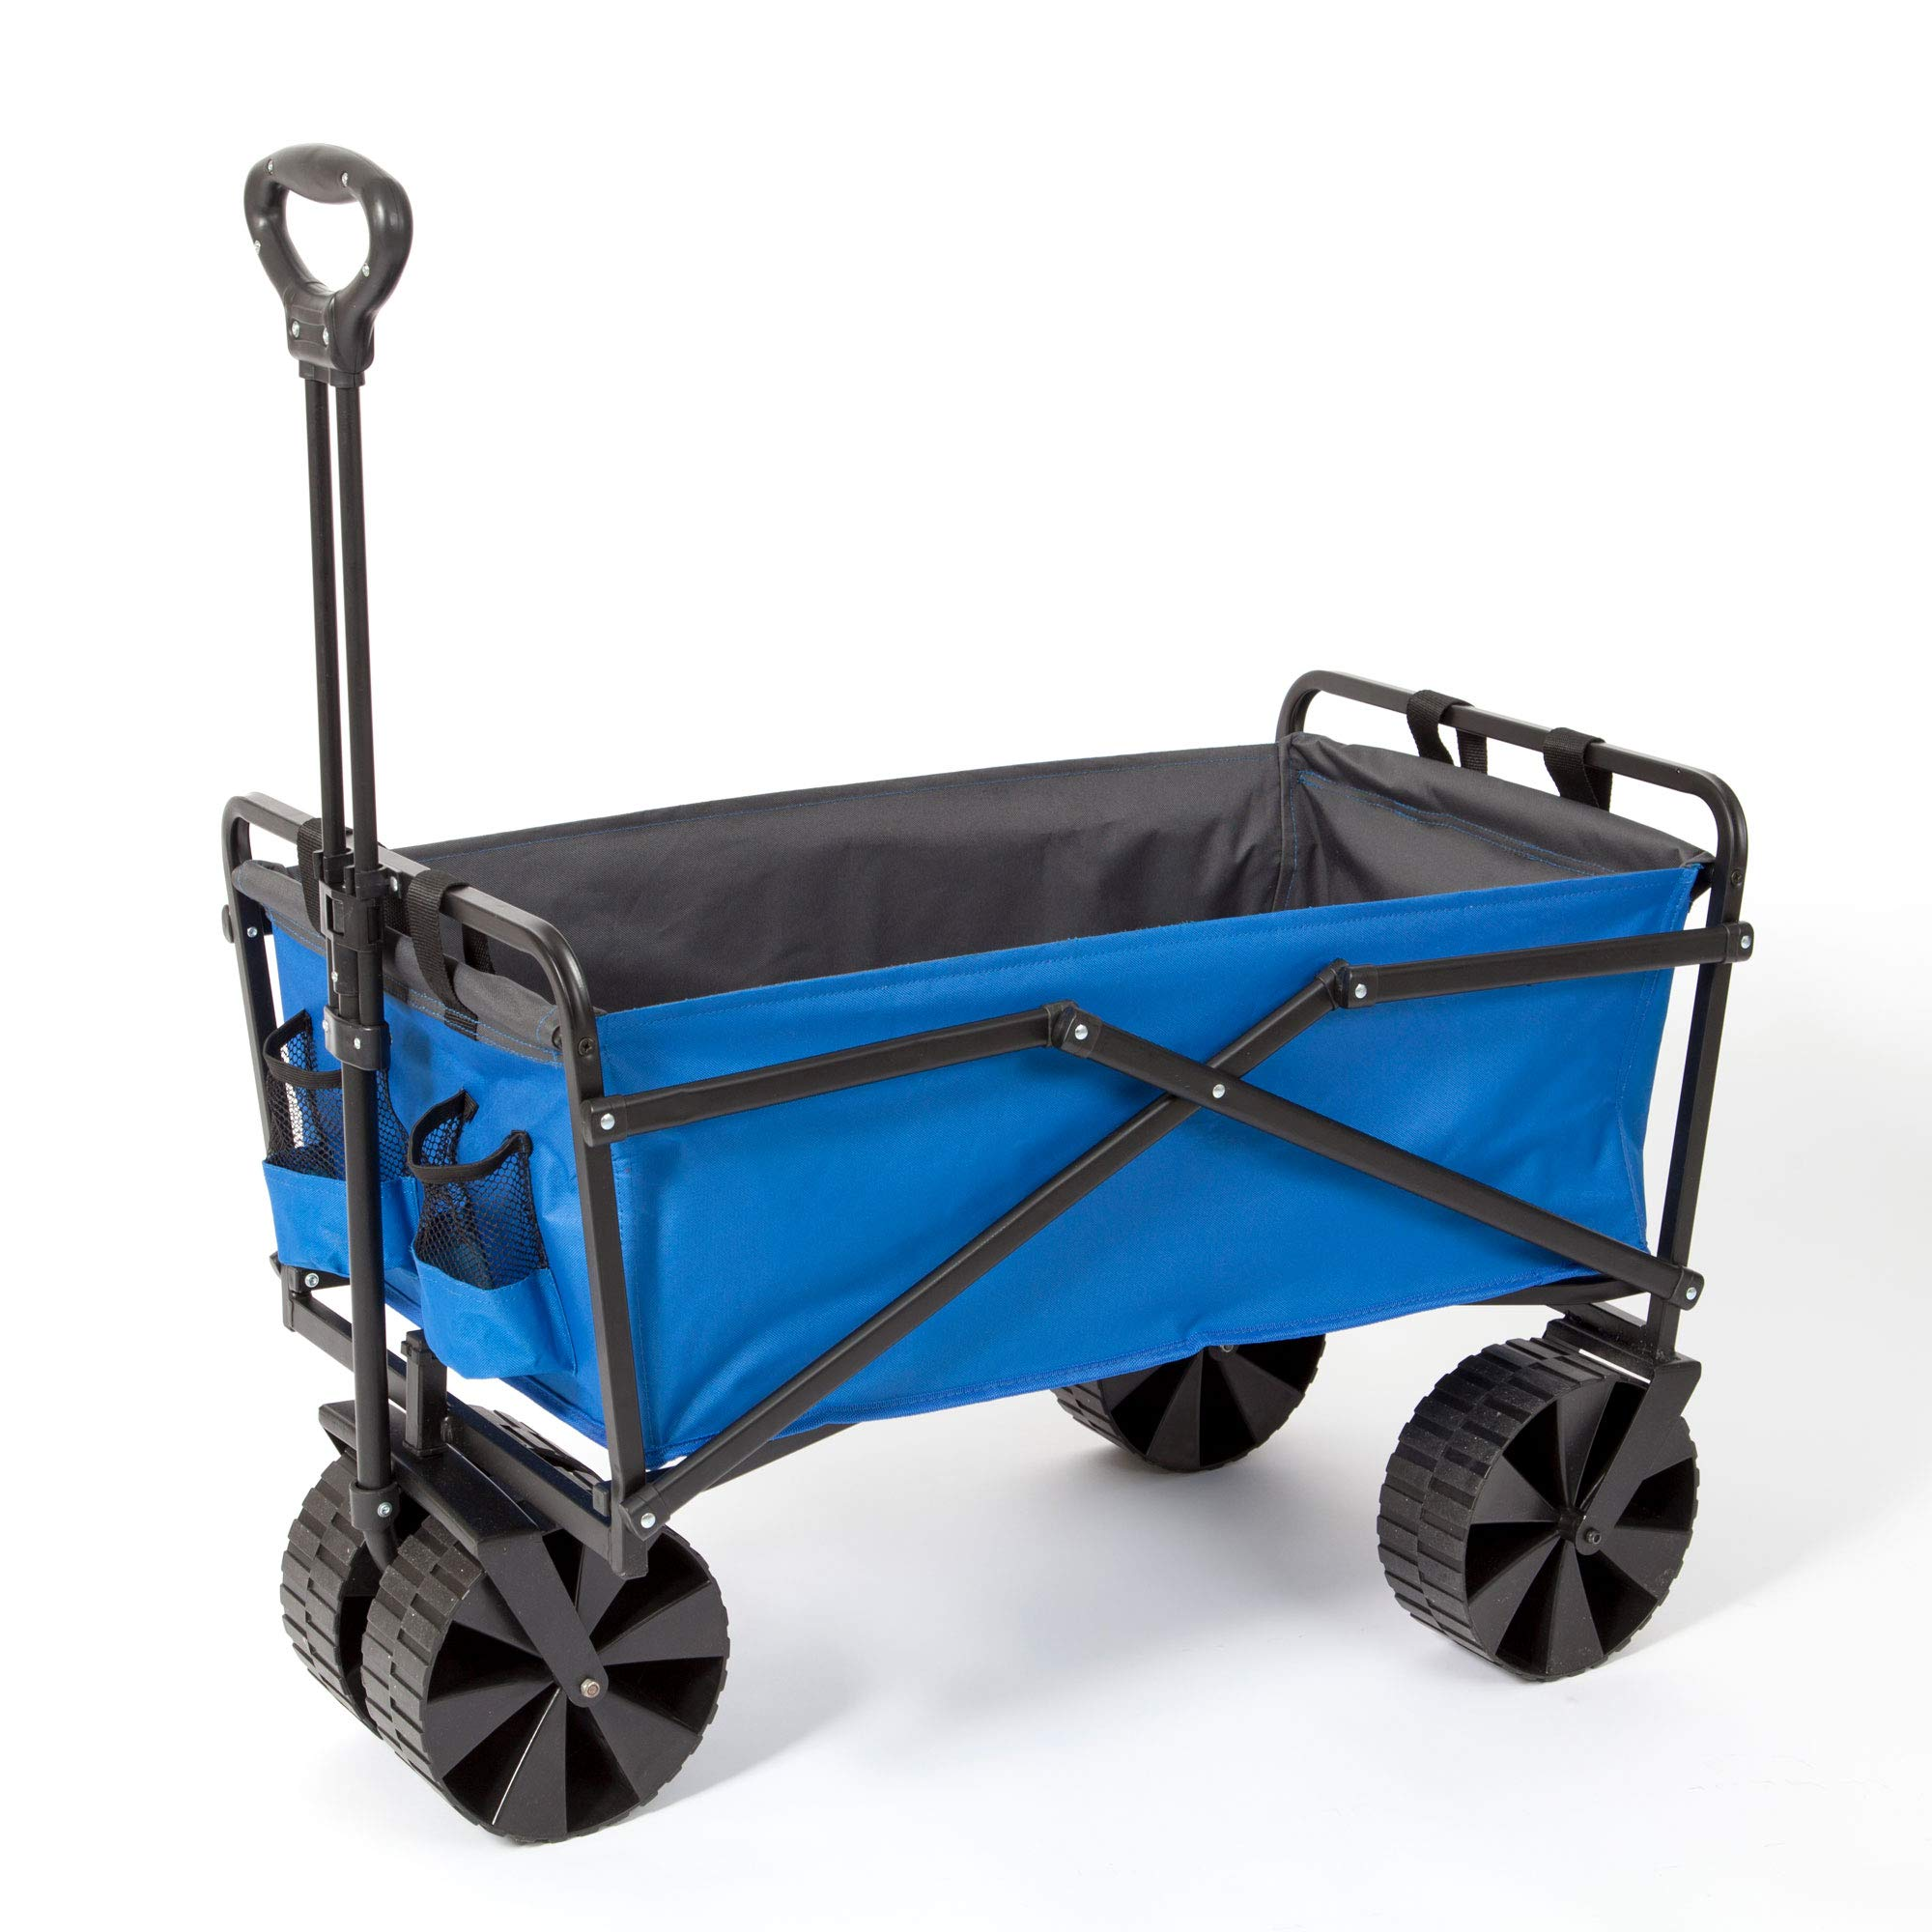 Seina Powder Coated Steel Collapsible Versatile Garden Cart Beach Wagon, Blue